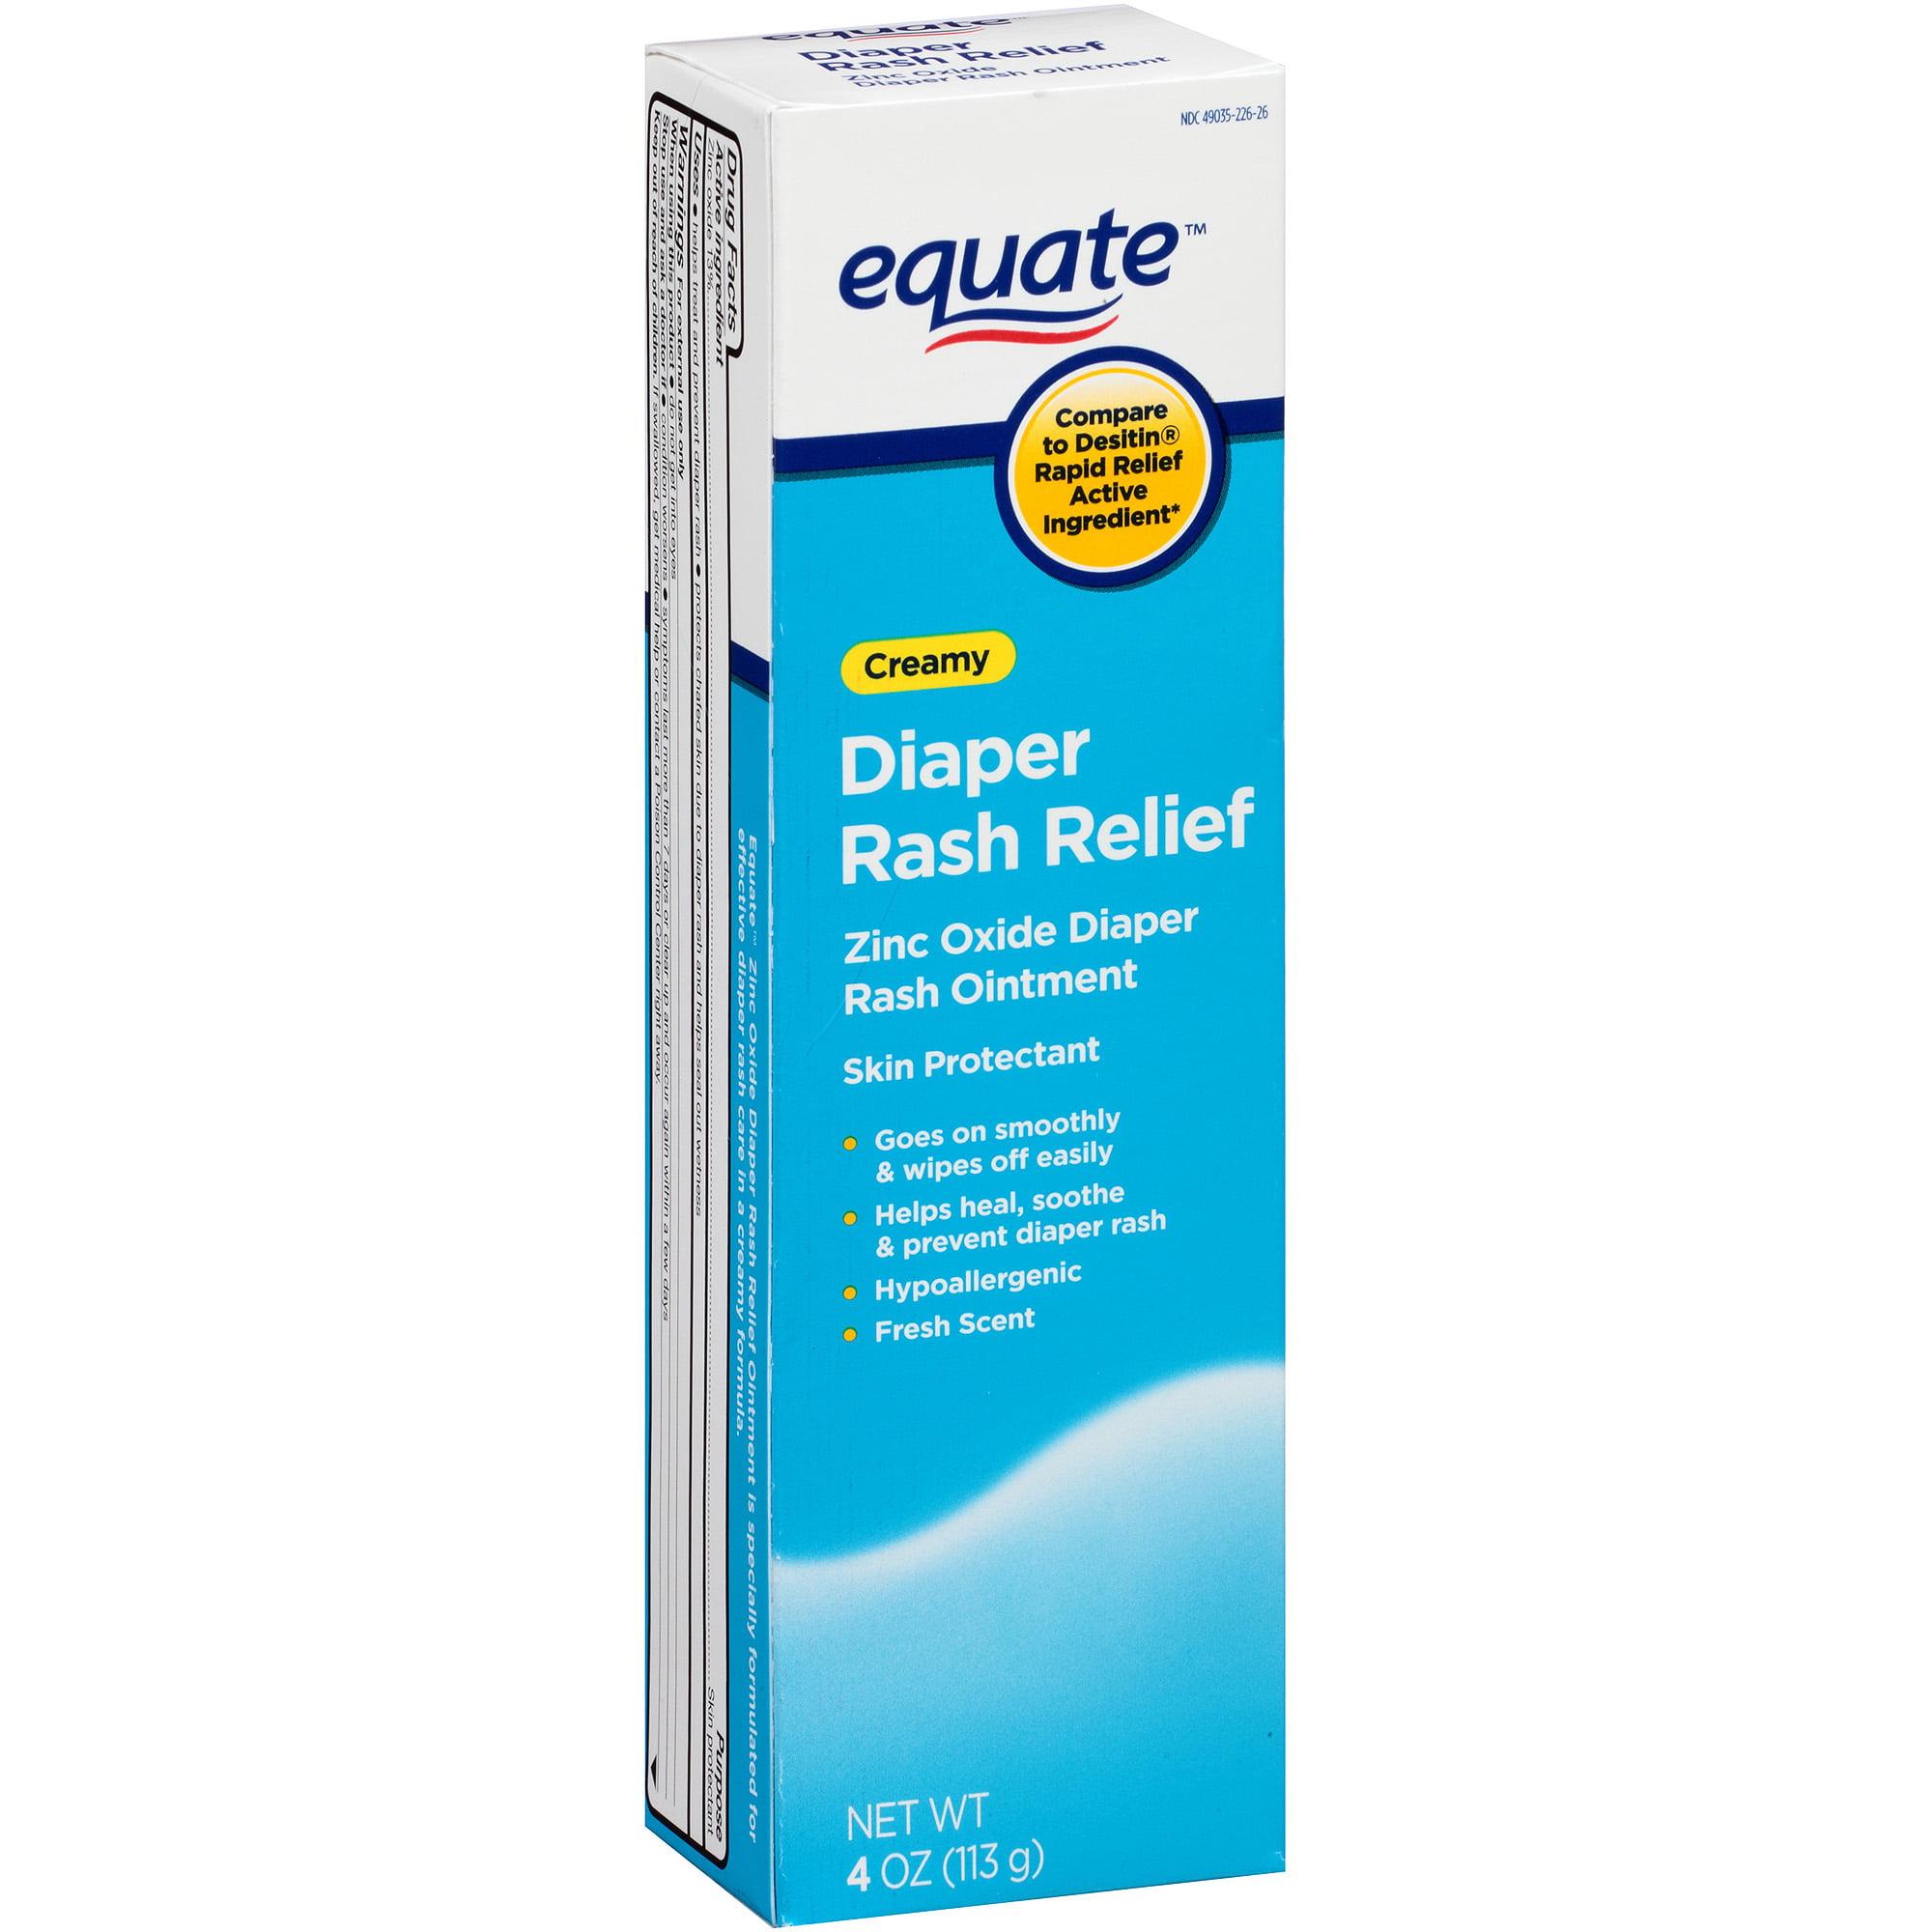 Equate Diaper Rash Cream, 4 oz